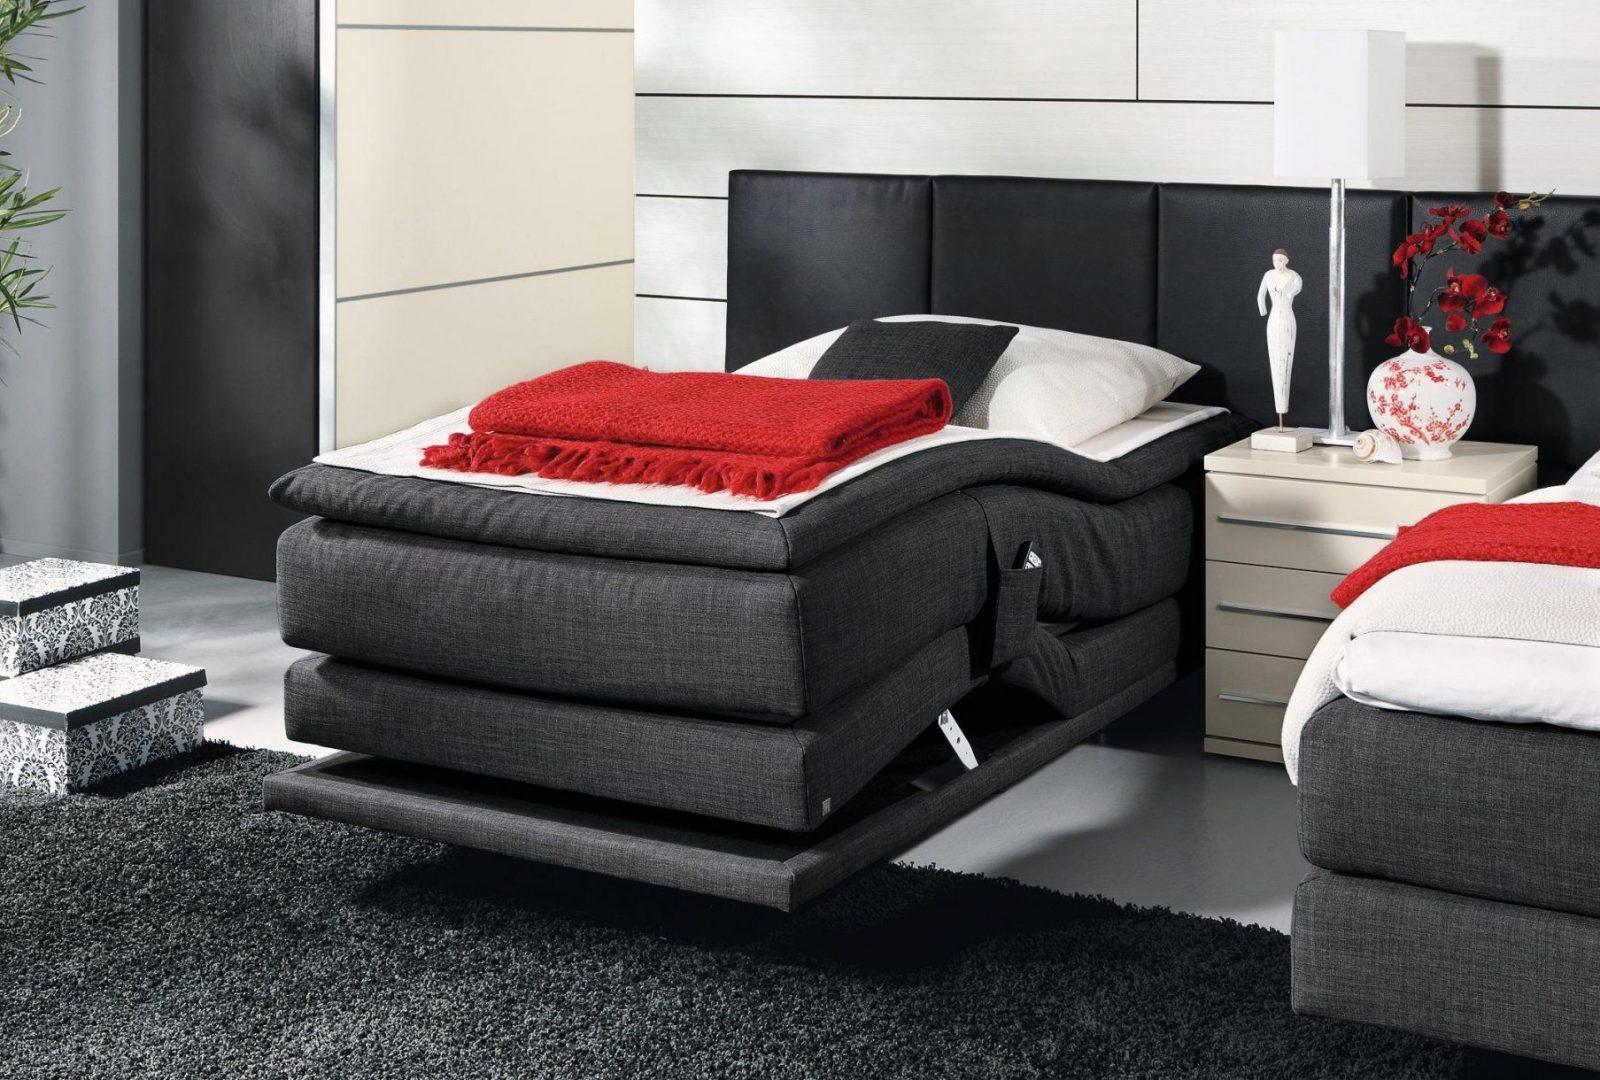 musterring boxspringbett set oneevolution select kaufen von boxspringbett musterring testsieger. Black Bedroom Furniture Sets. Home Design Ideas